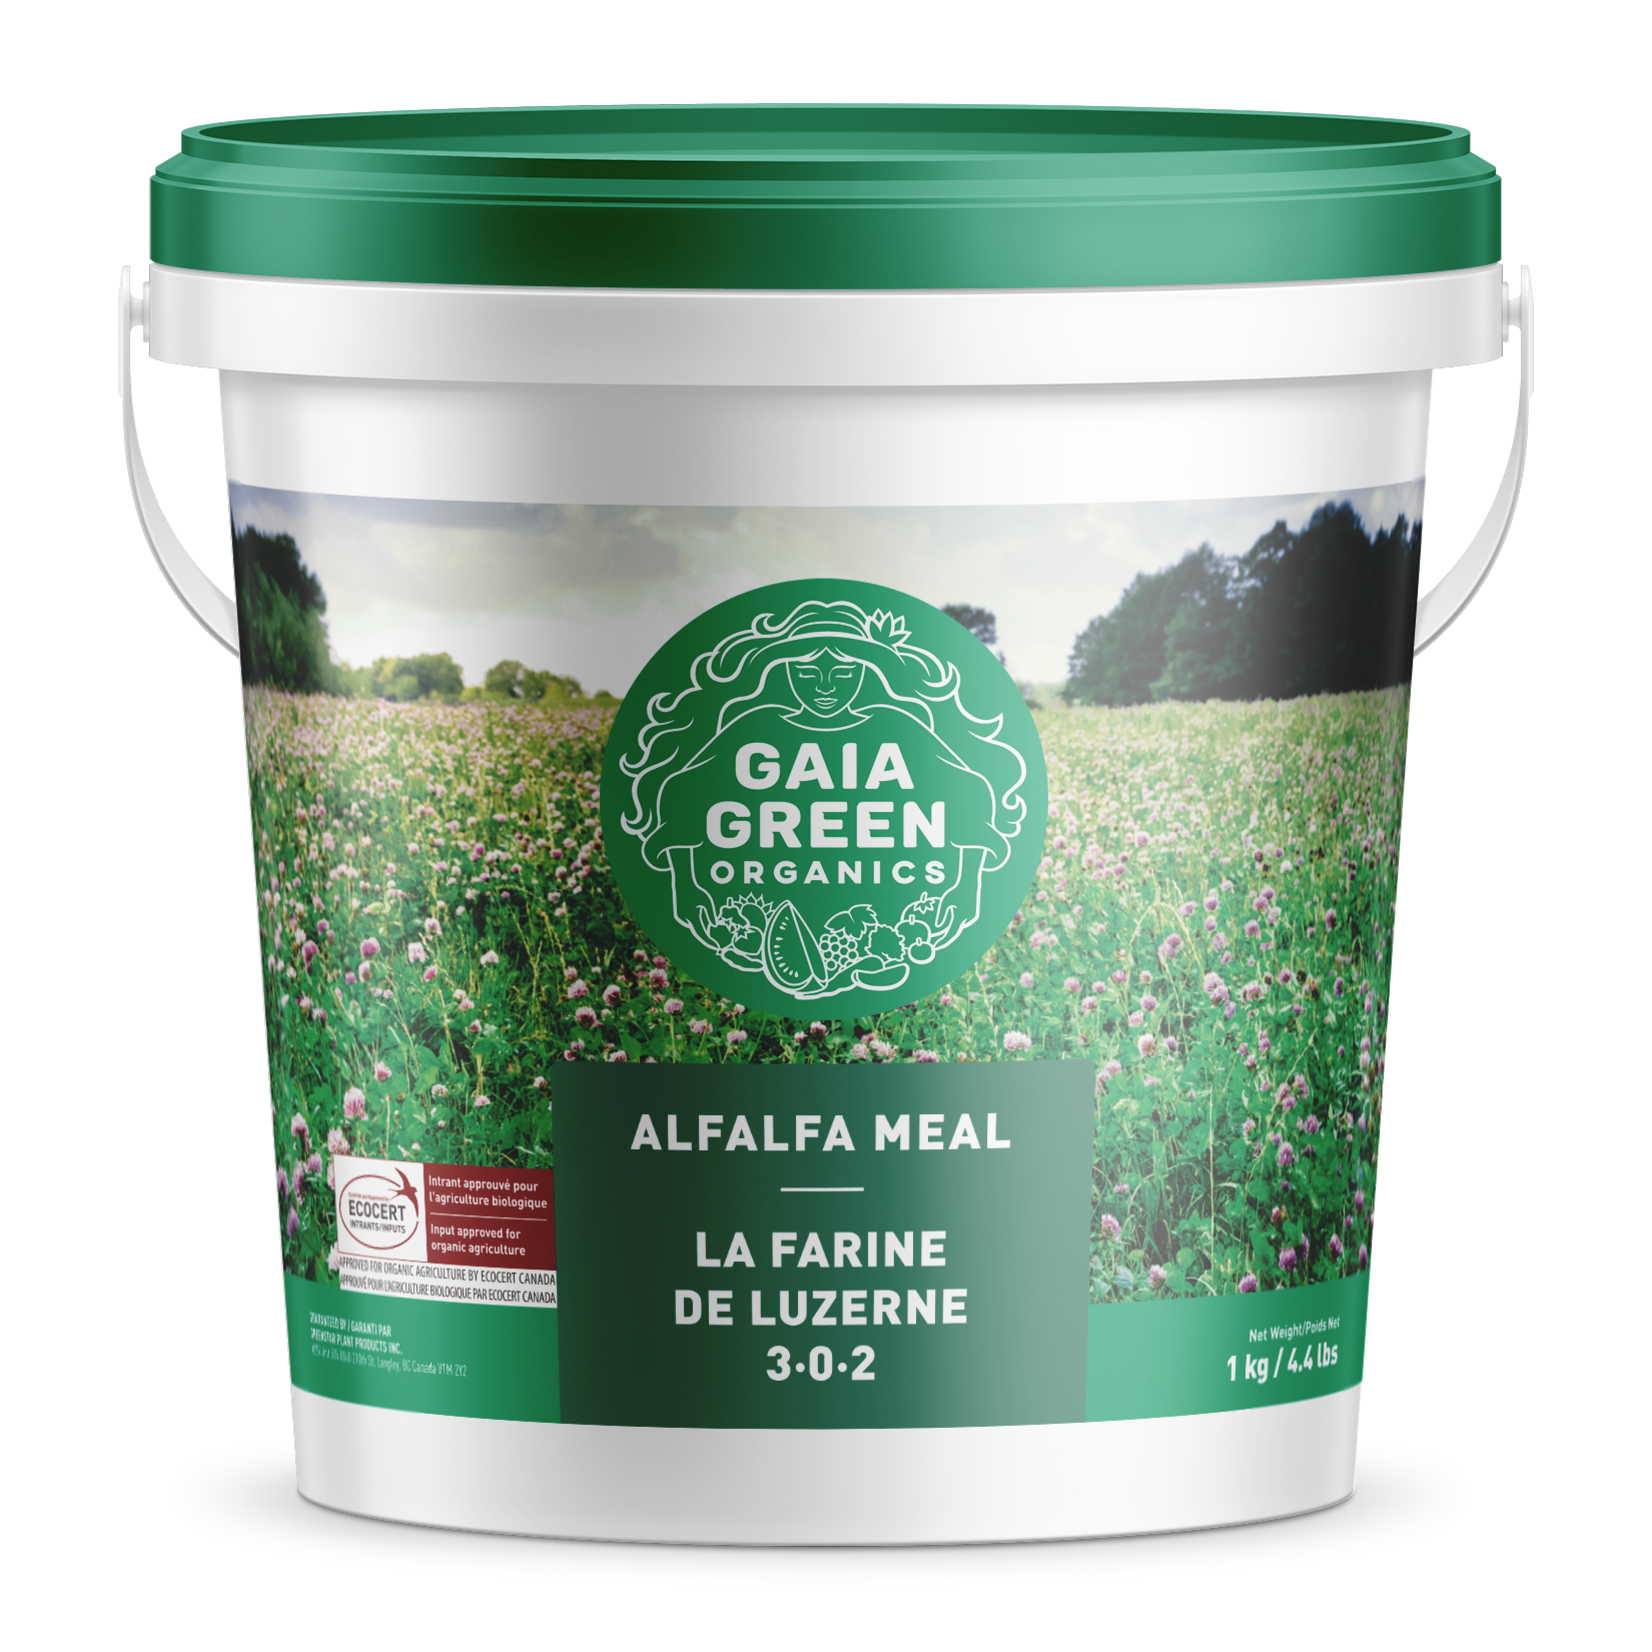 gaia green Gaia Green ALFALFA MEAL 1KG